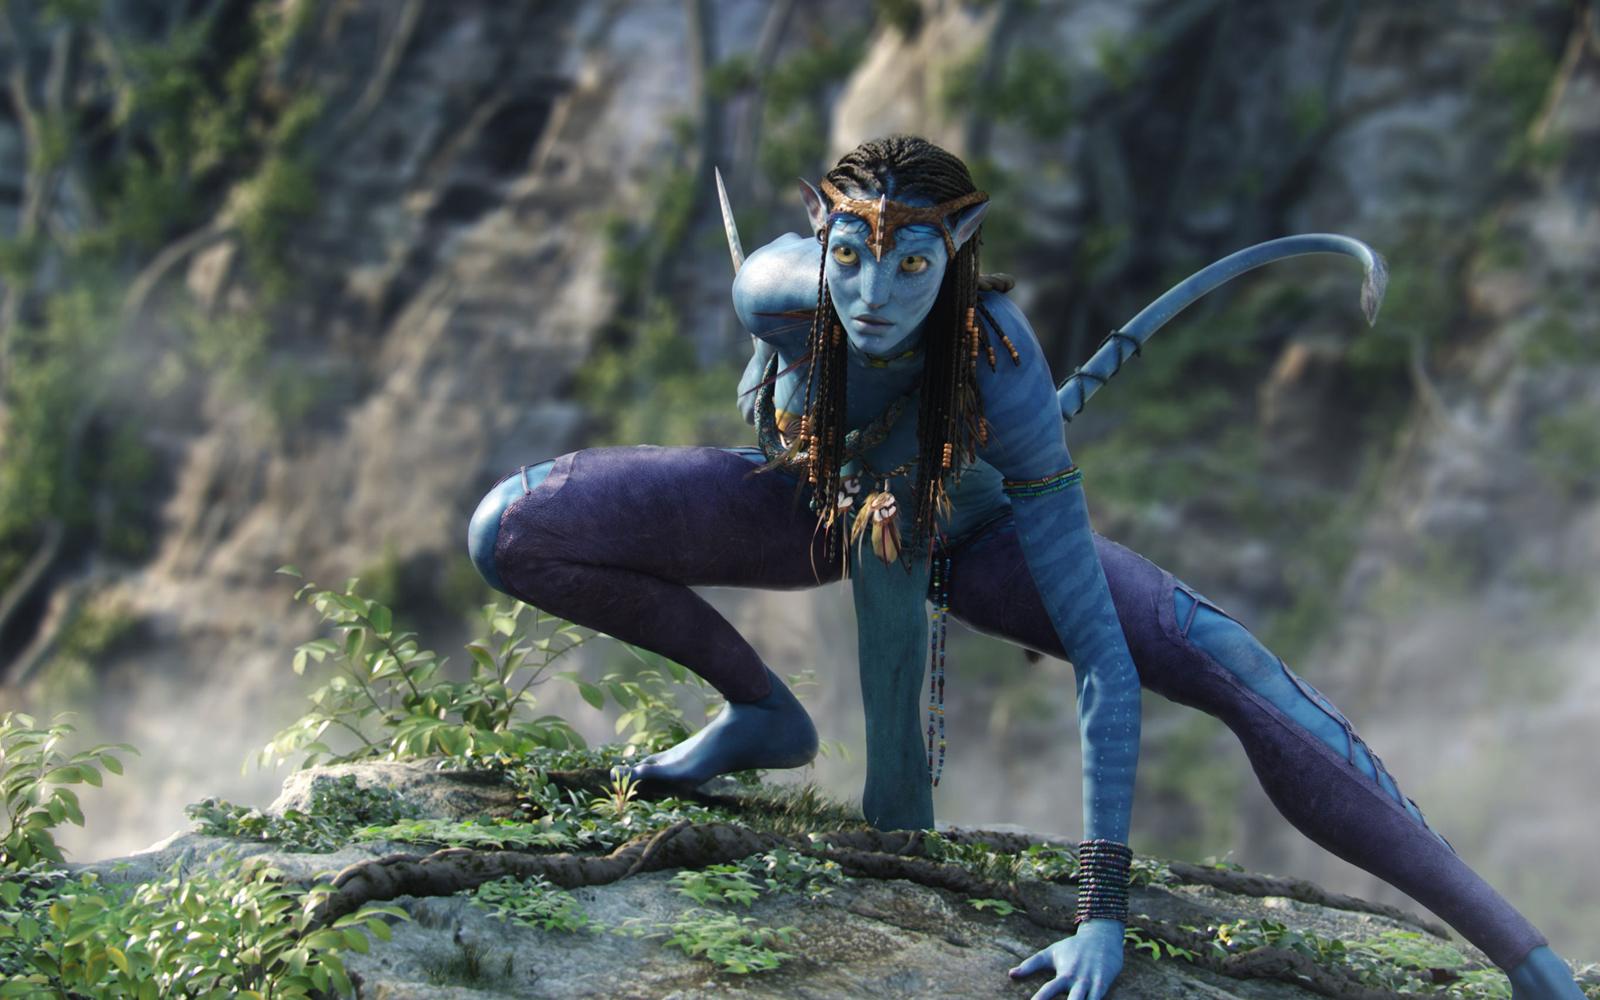 'Avatar' sequels start arriving on December 18th, 2020